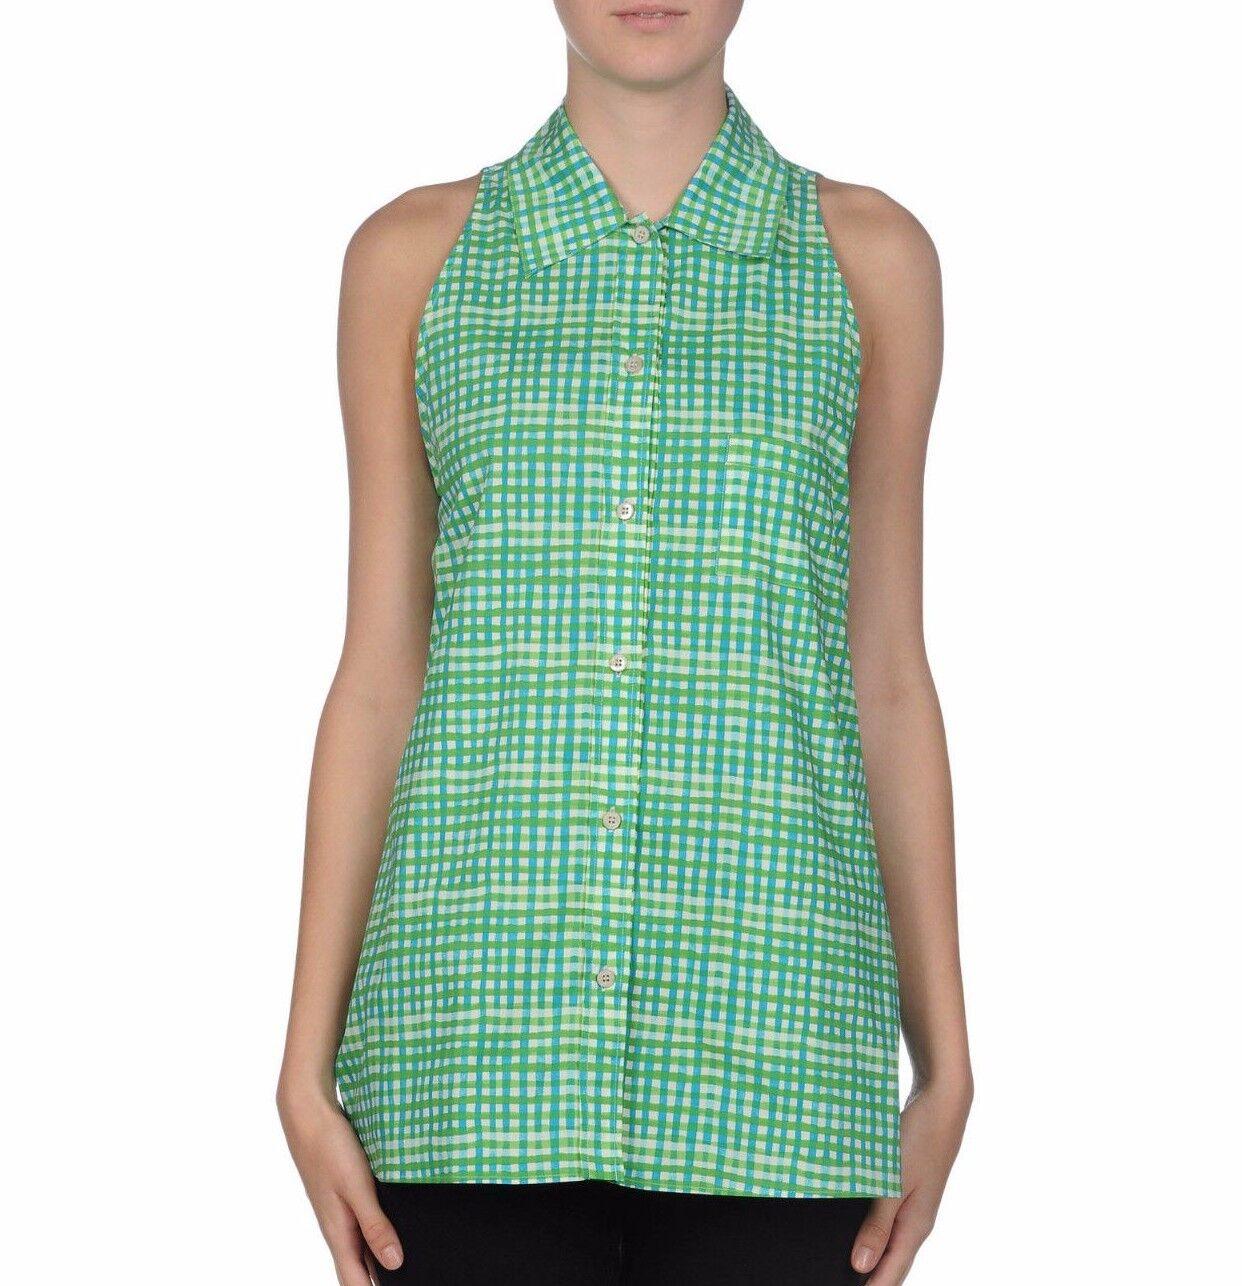 NWOT Authentic PRADA Cotton Blend Grün Sleeveless Shirt Top EU-38 US-2